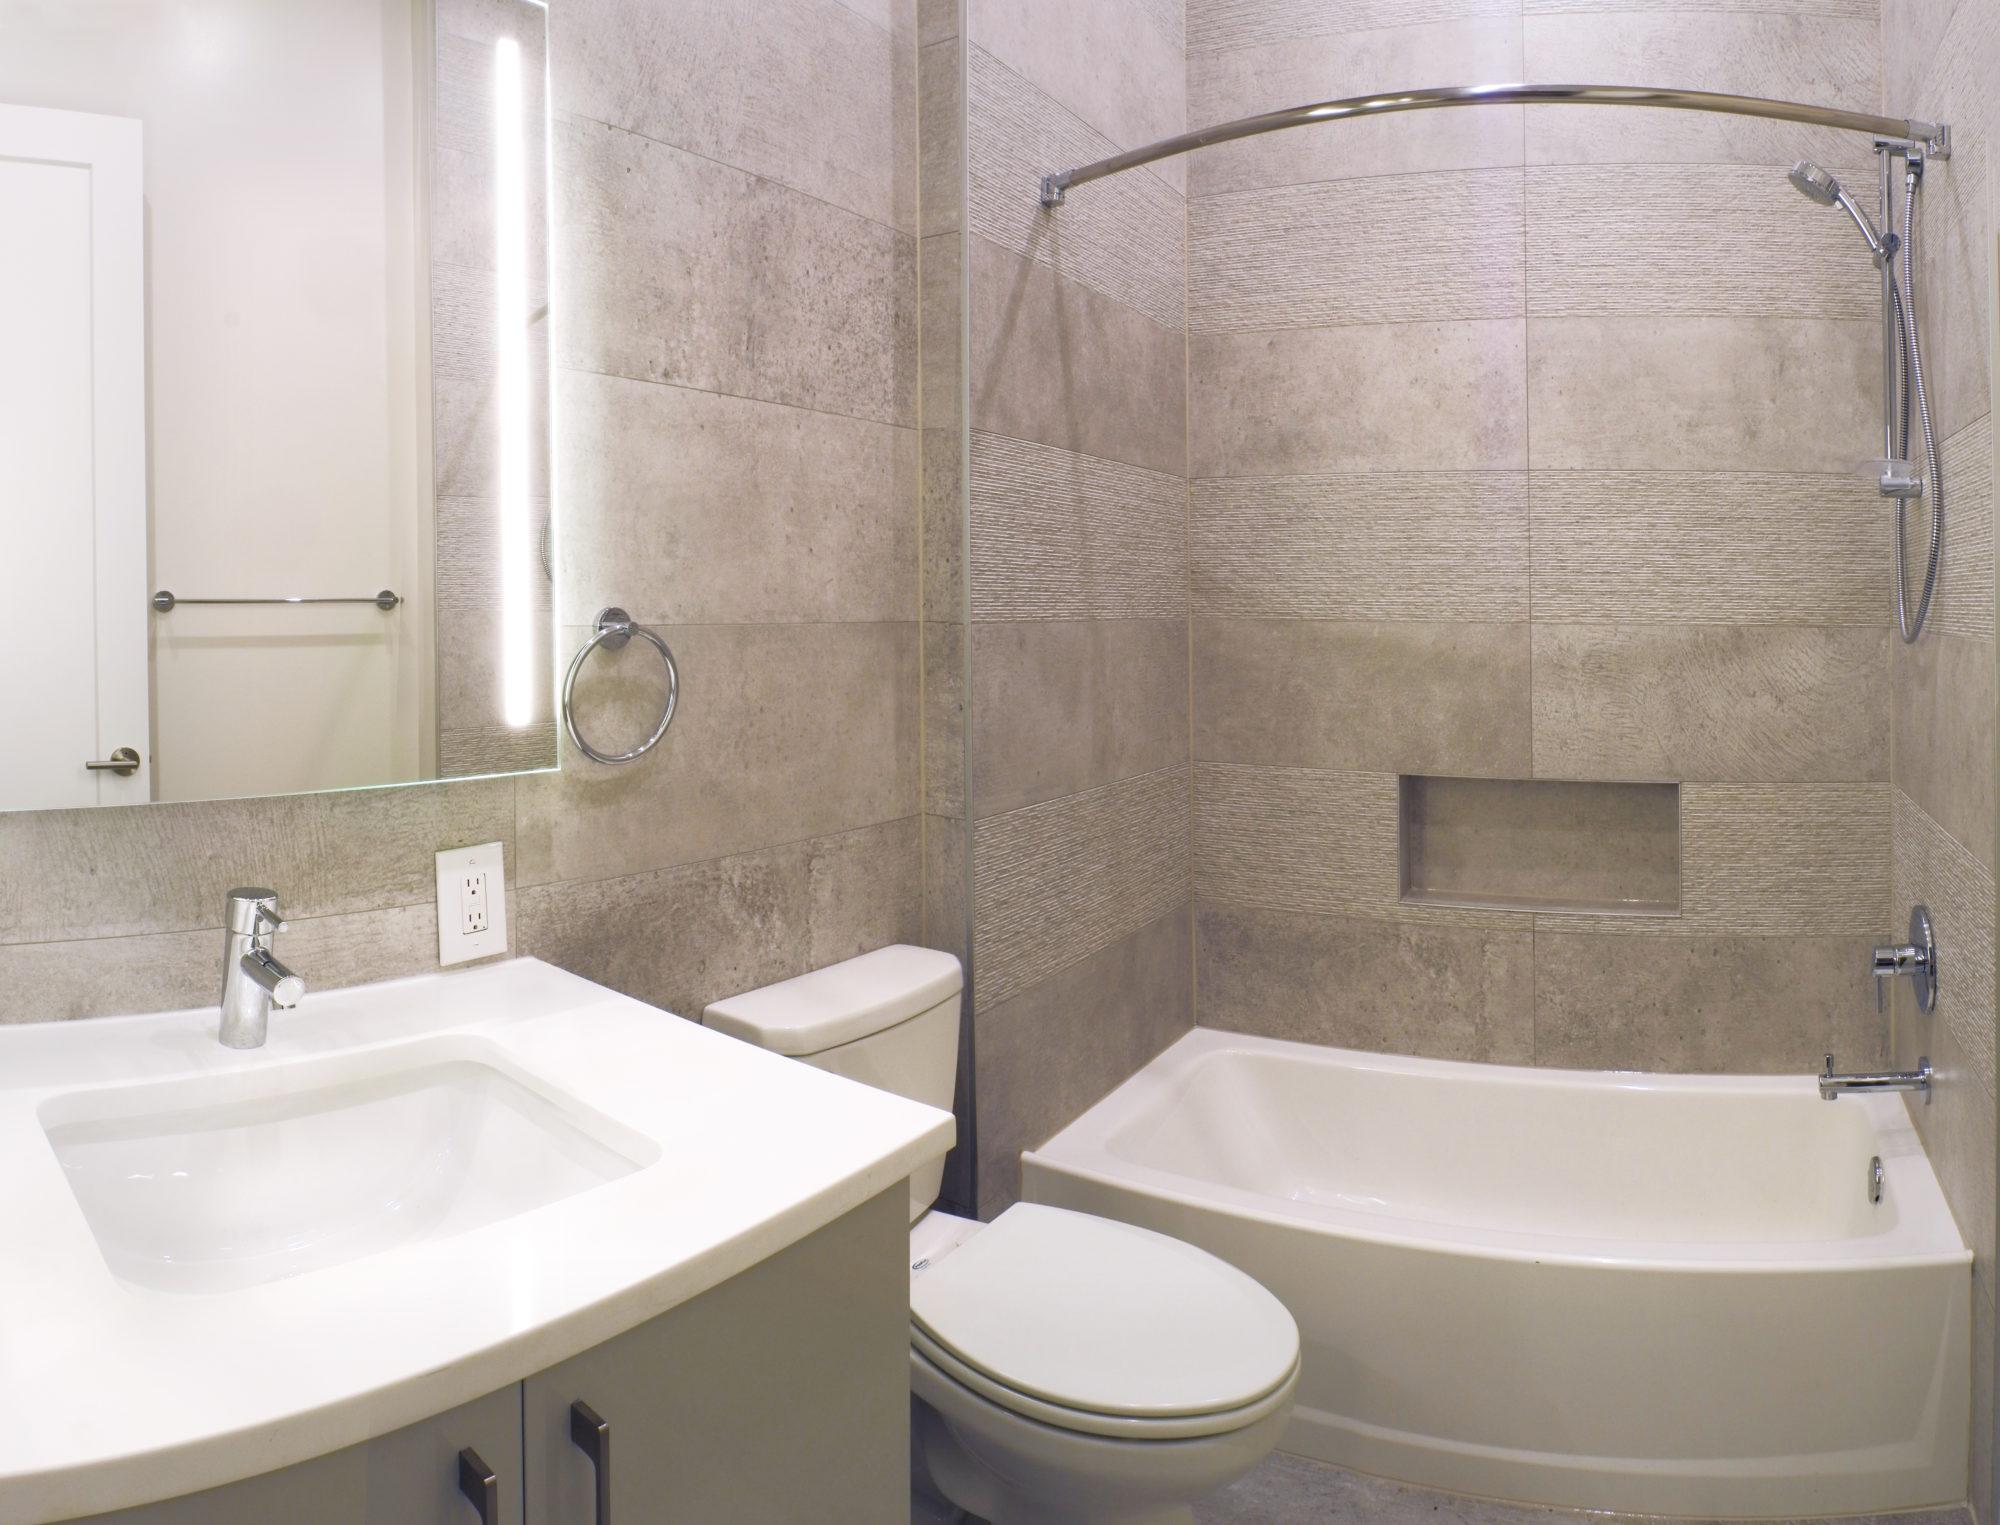 122-S-8th-Bathrm